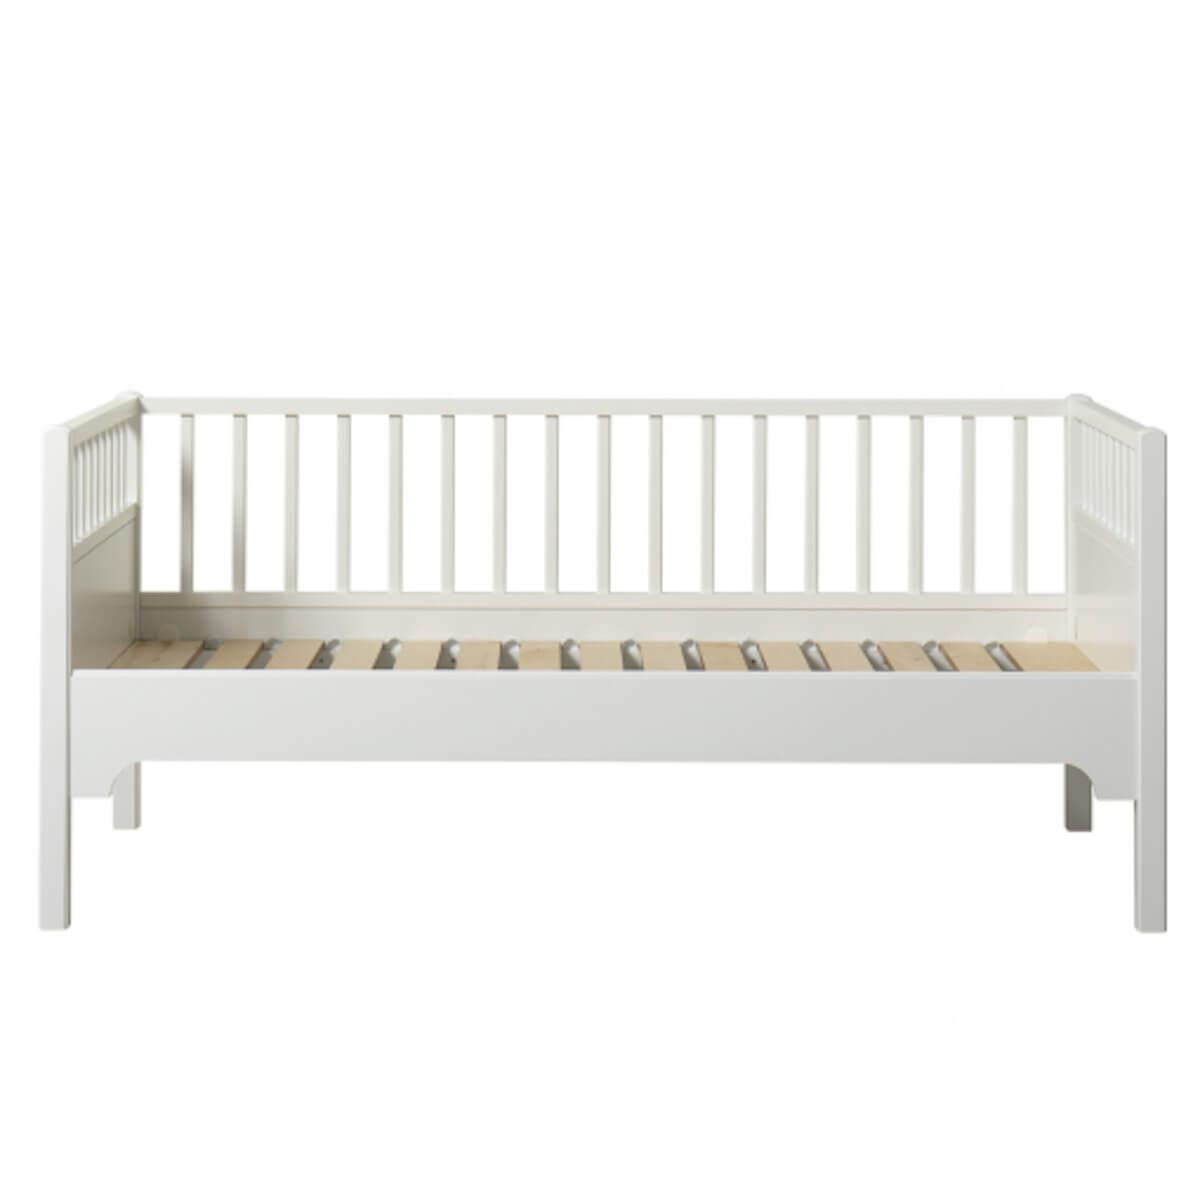 Lit banquette junior 90x160cm SEASIDE CLASSIC Oliver Furniture blanc